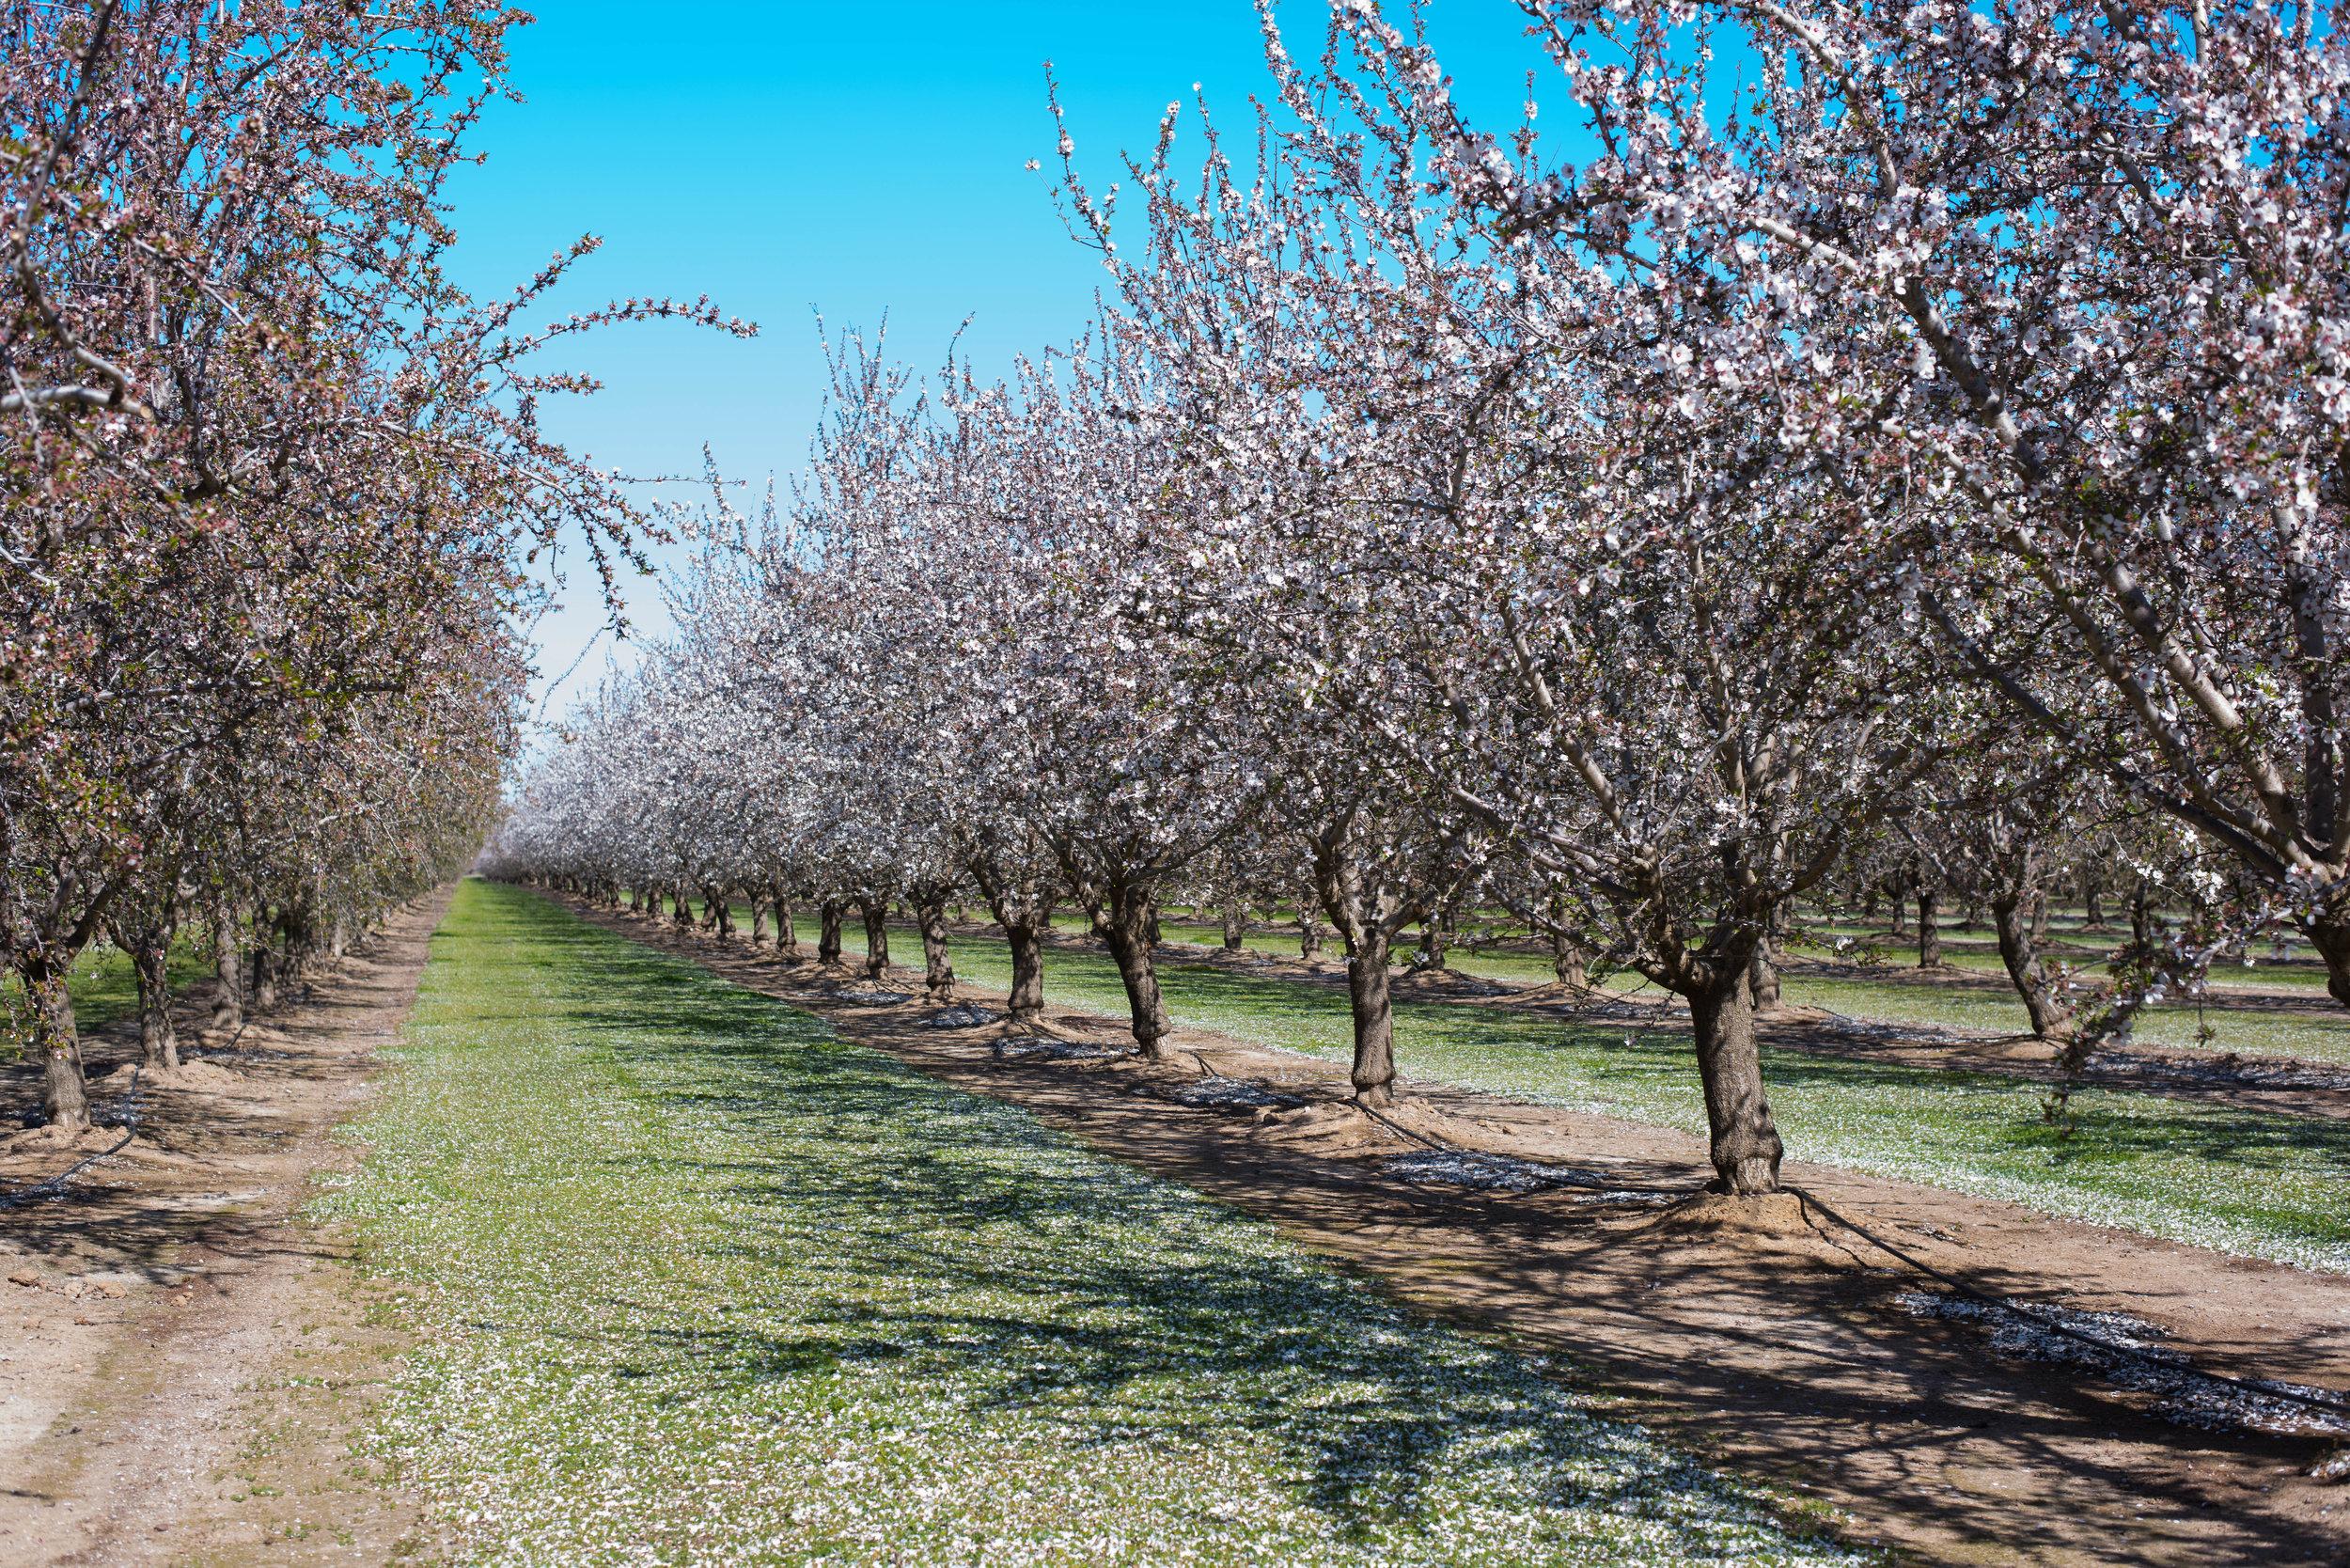 Almond Breeze almond grove